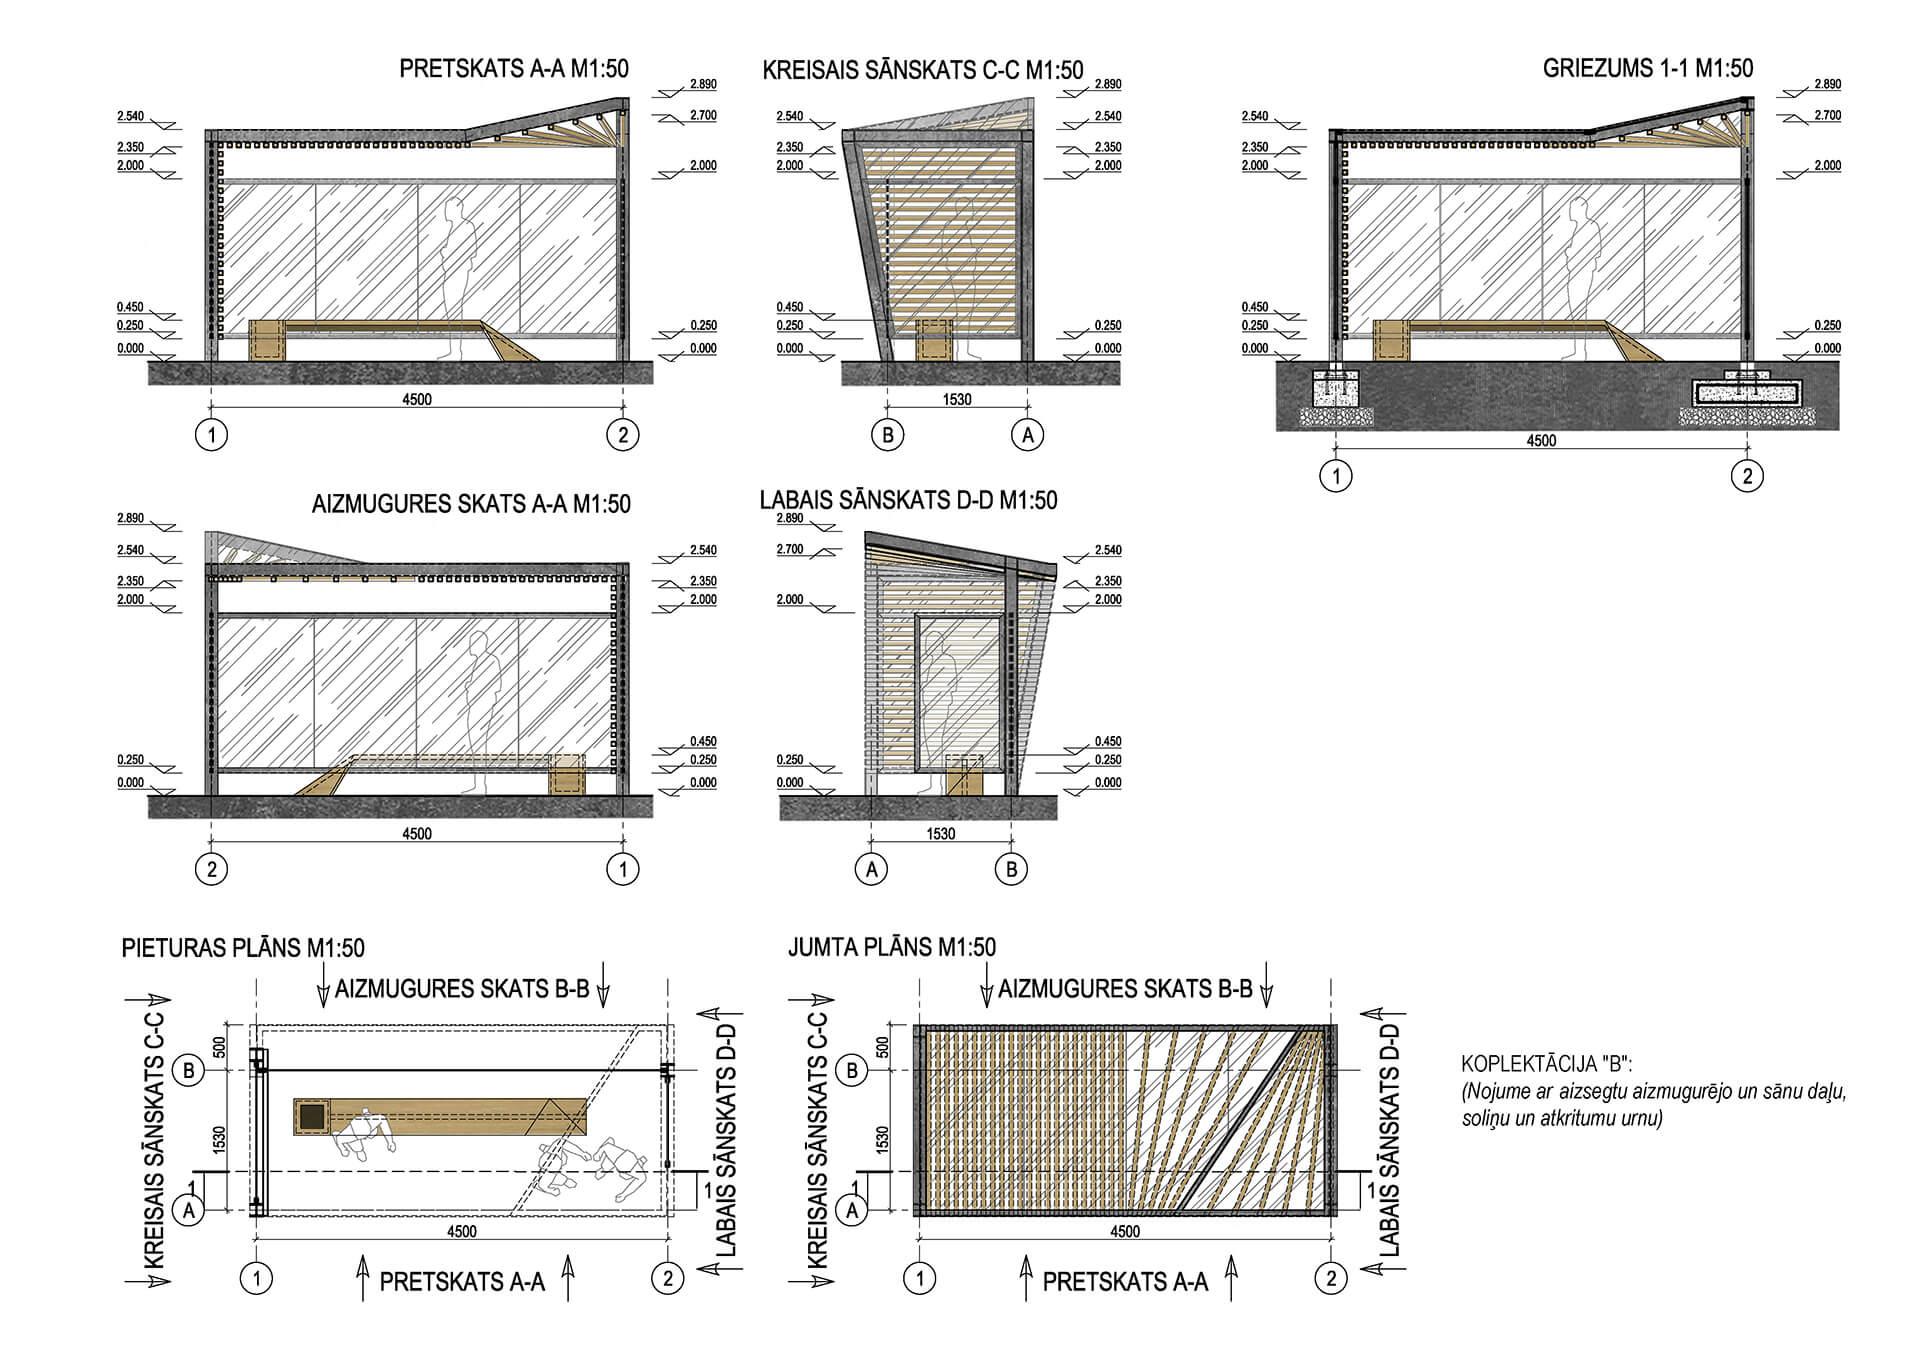 https://laagaarchitects.lv/wp-content/uploads/2019/11/03-06-12-JPD.jpg